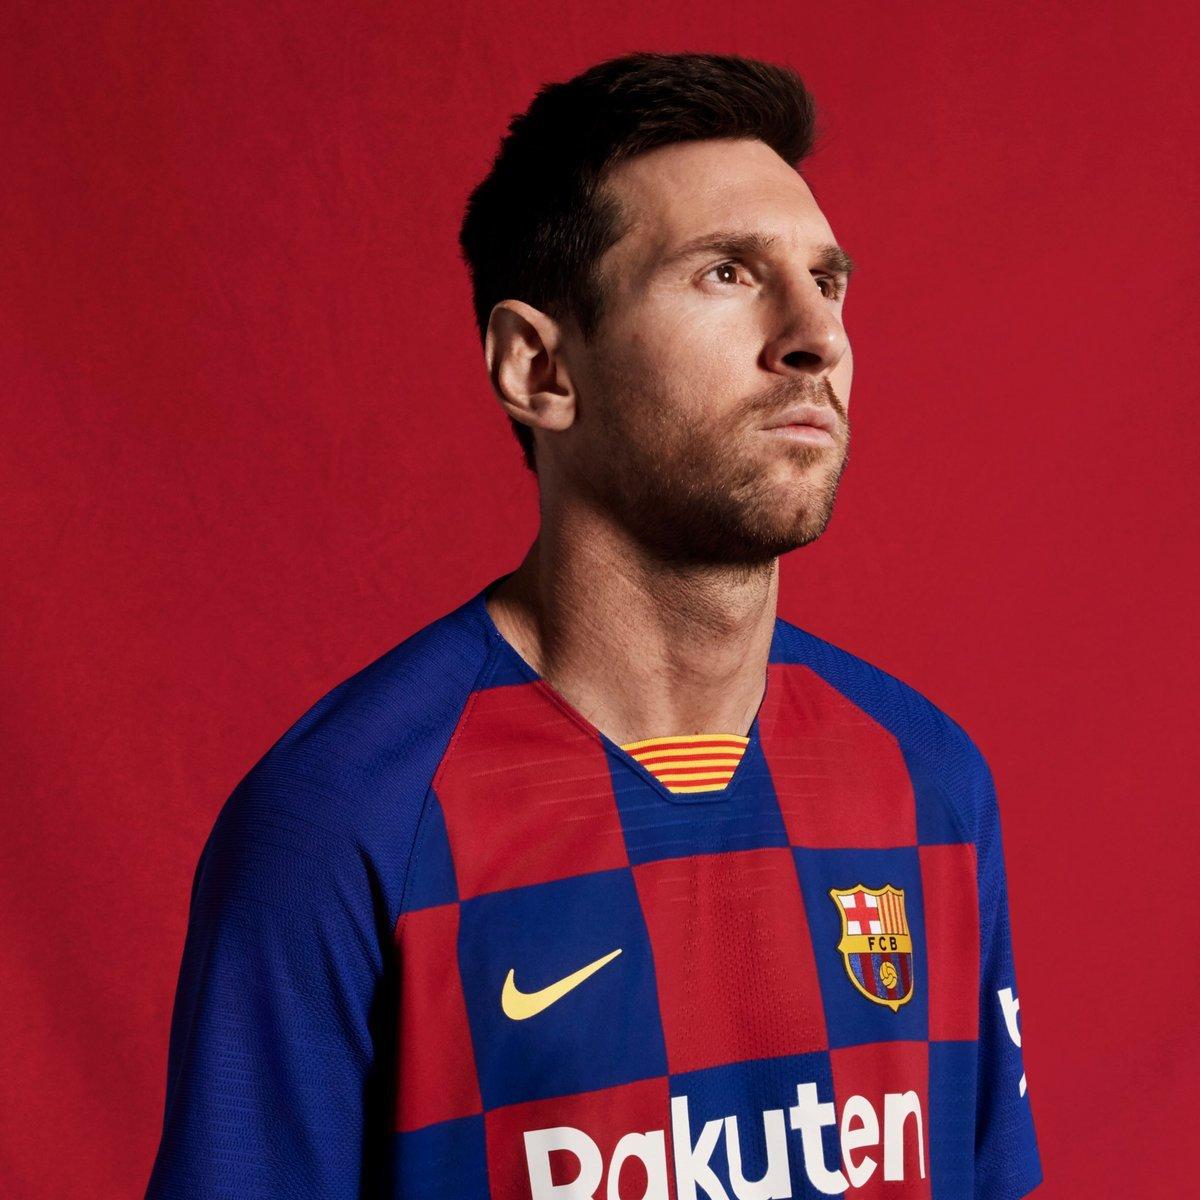 """Барселона"" представила домашнюю форму на сезон-2019/20 (Фото, Видео) - изображение 1"